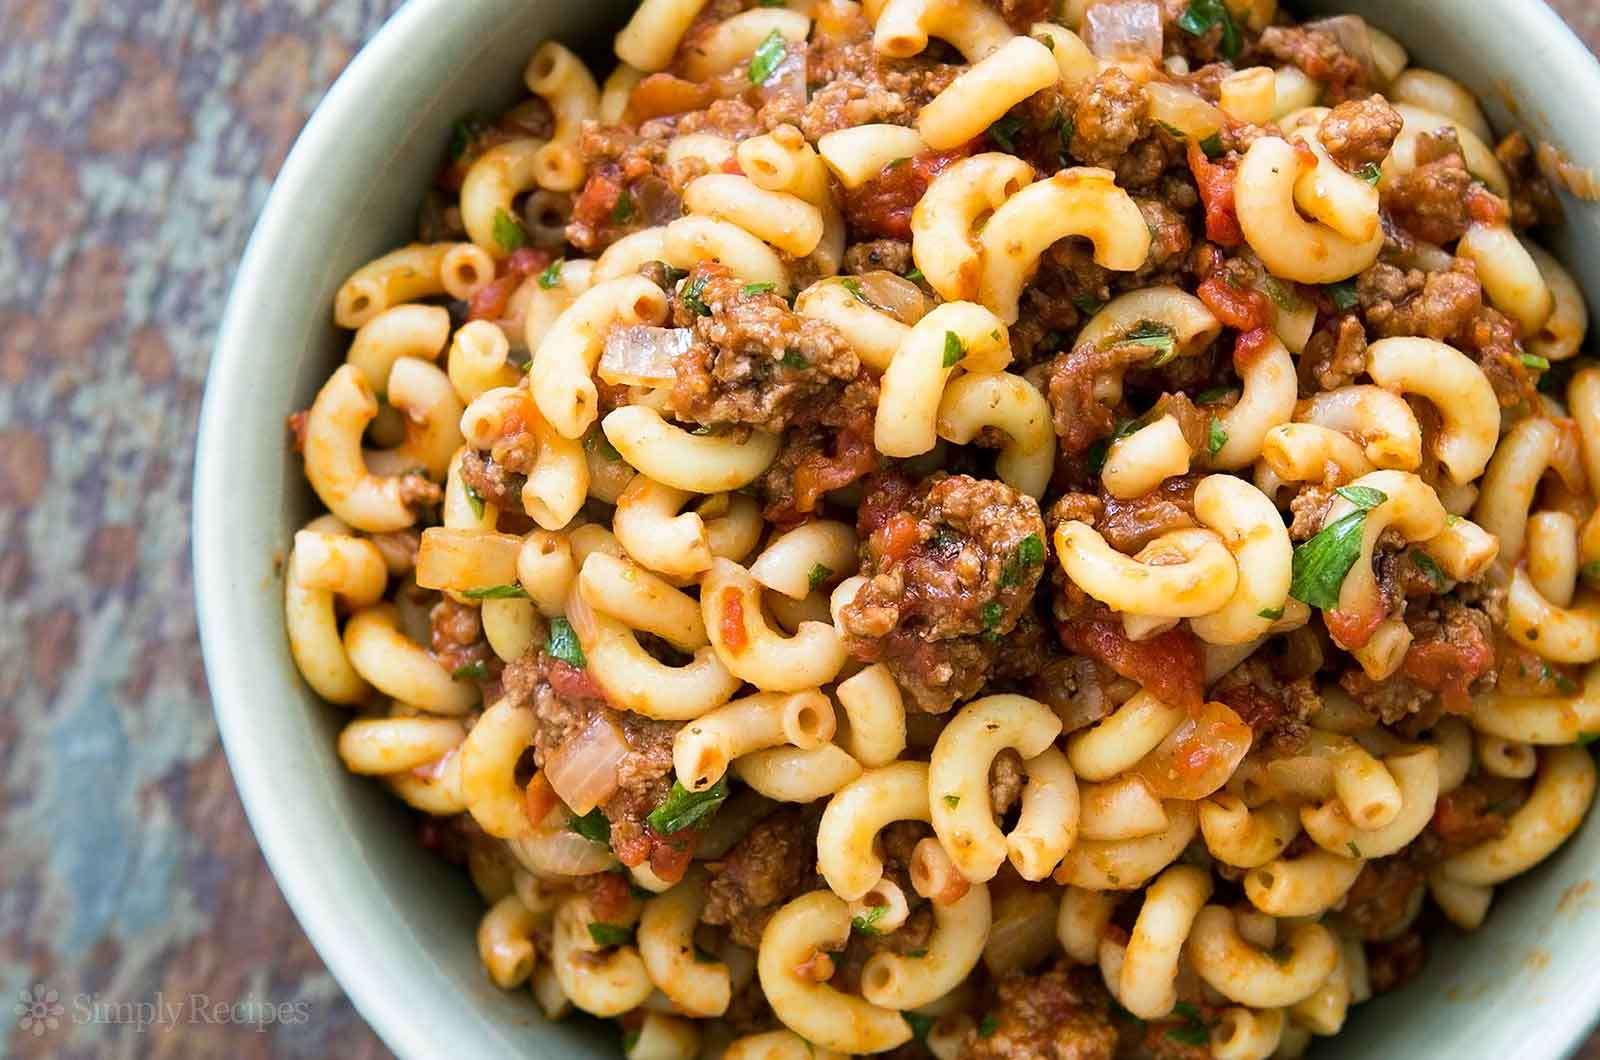 Hamburger and Macaroni in a bowl